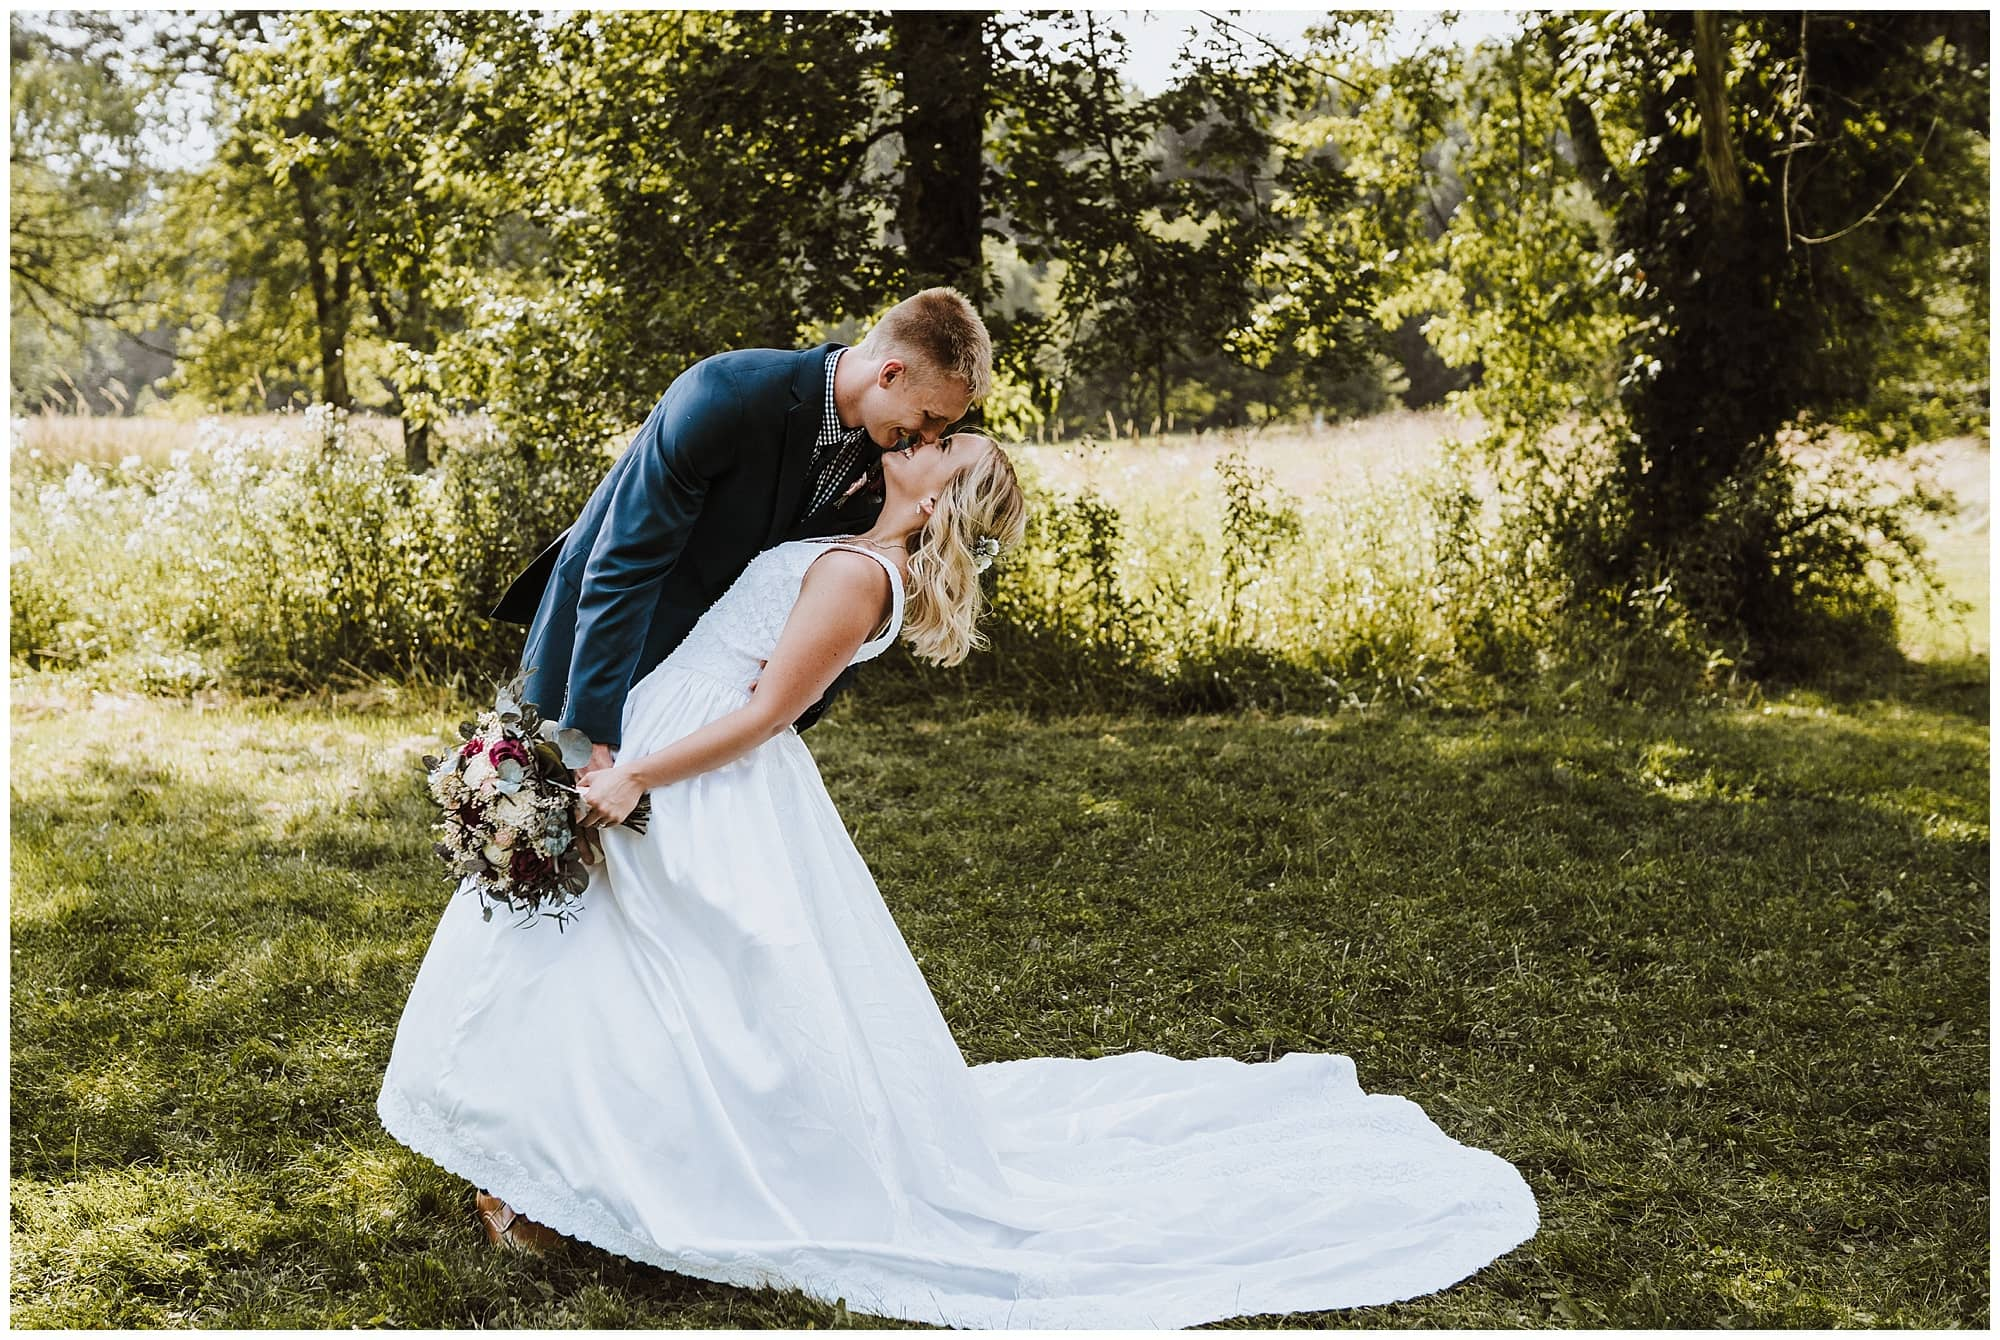 Adrian Michigan Wedding Photographer-88.JPG